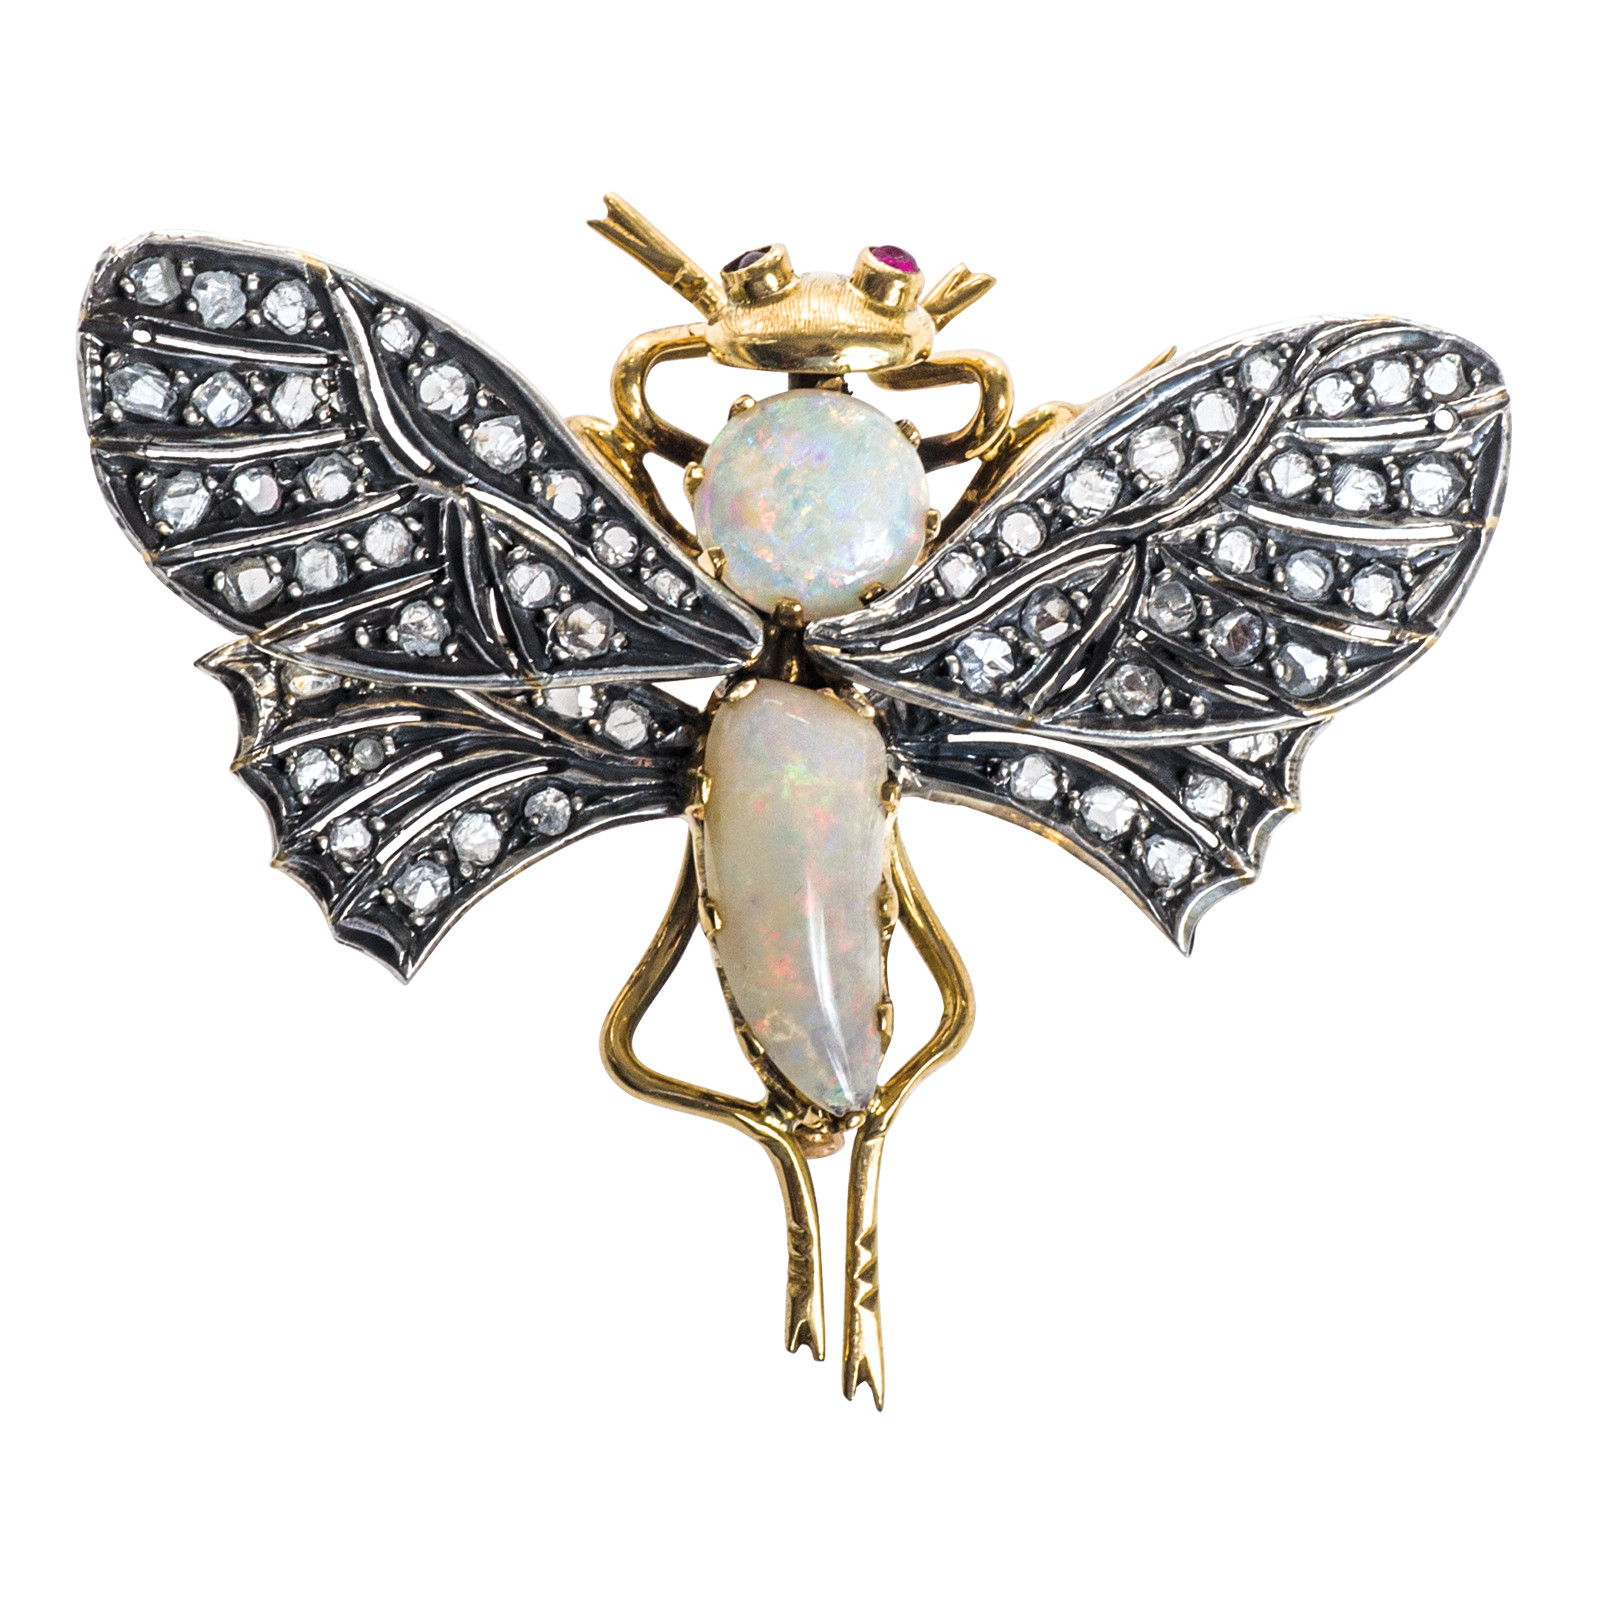 Vintage 1.00 CTW Diamond Dragonfly Brooch